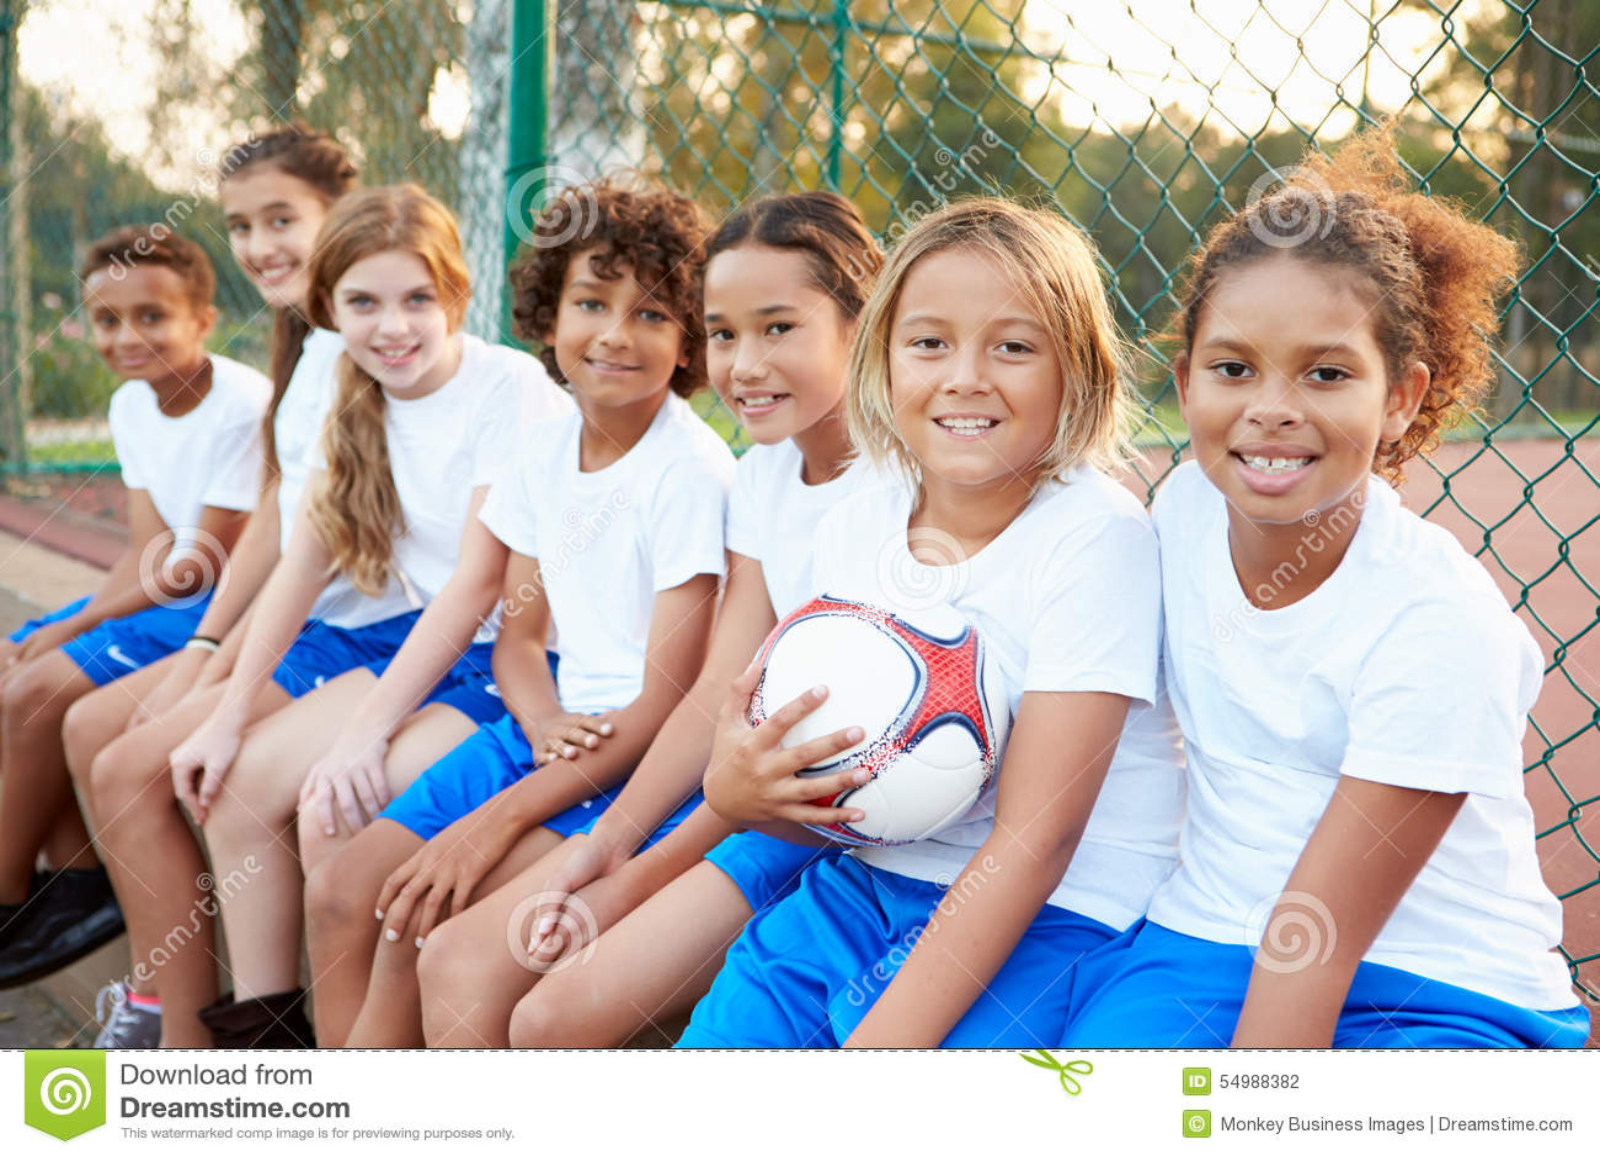 Portrait du football Team Training Together de la jeunesse